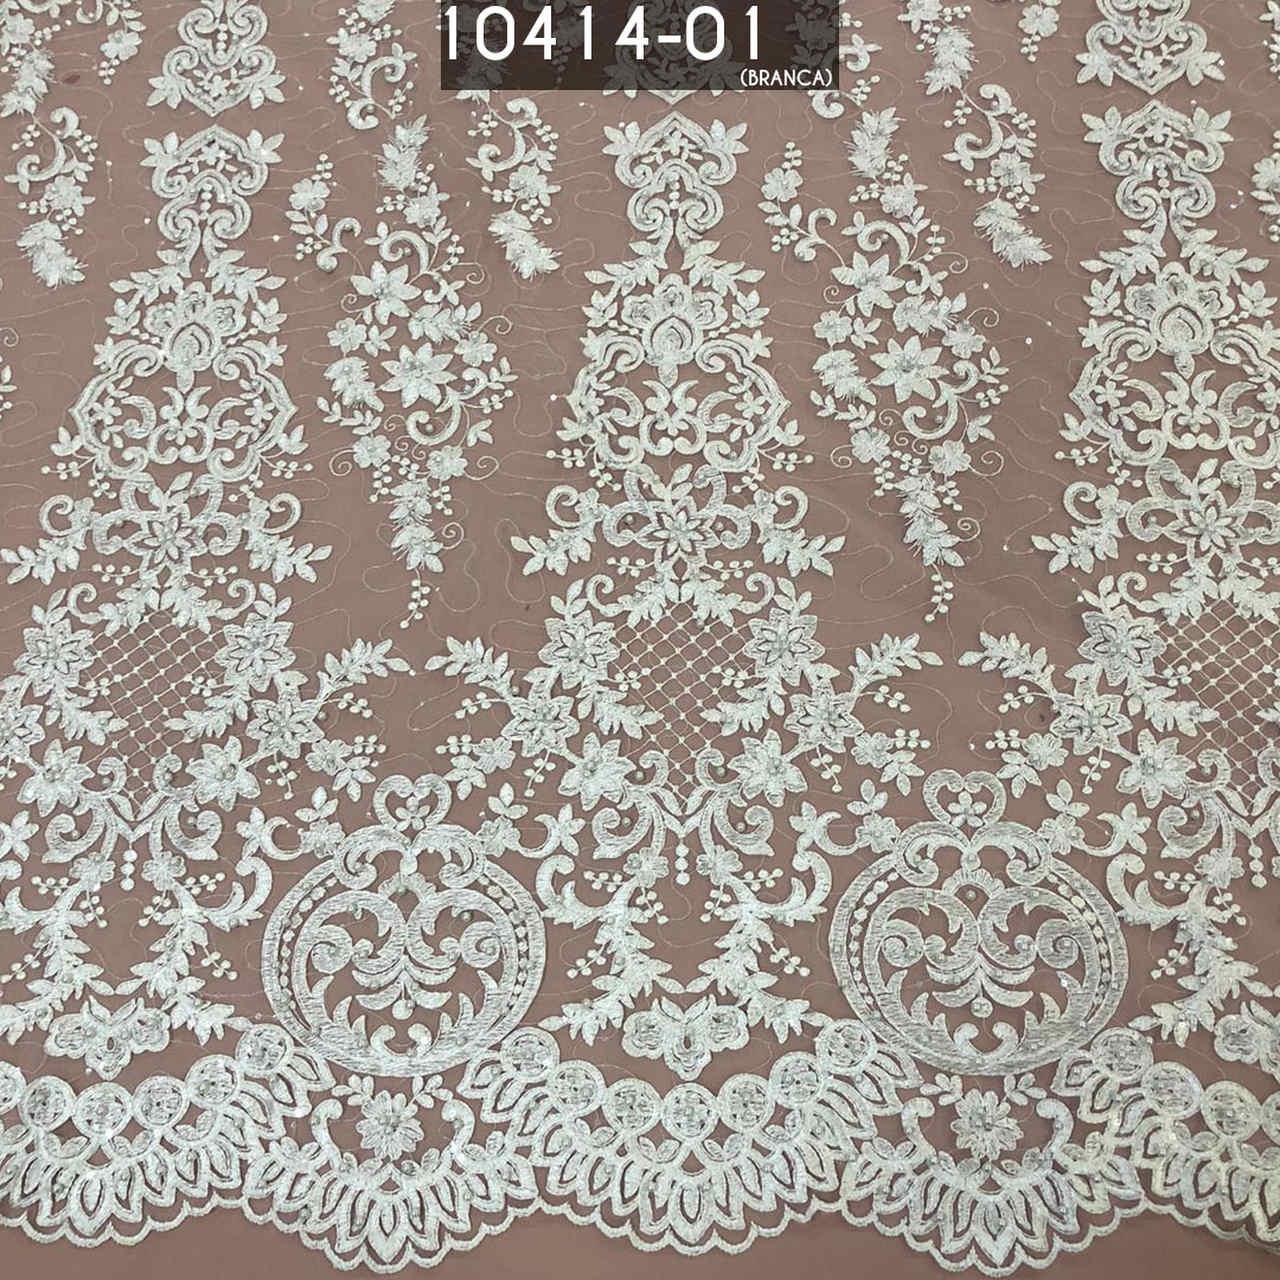 Tecido Tule Renda Bordado Em Pedrarias Branco